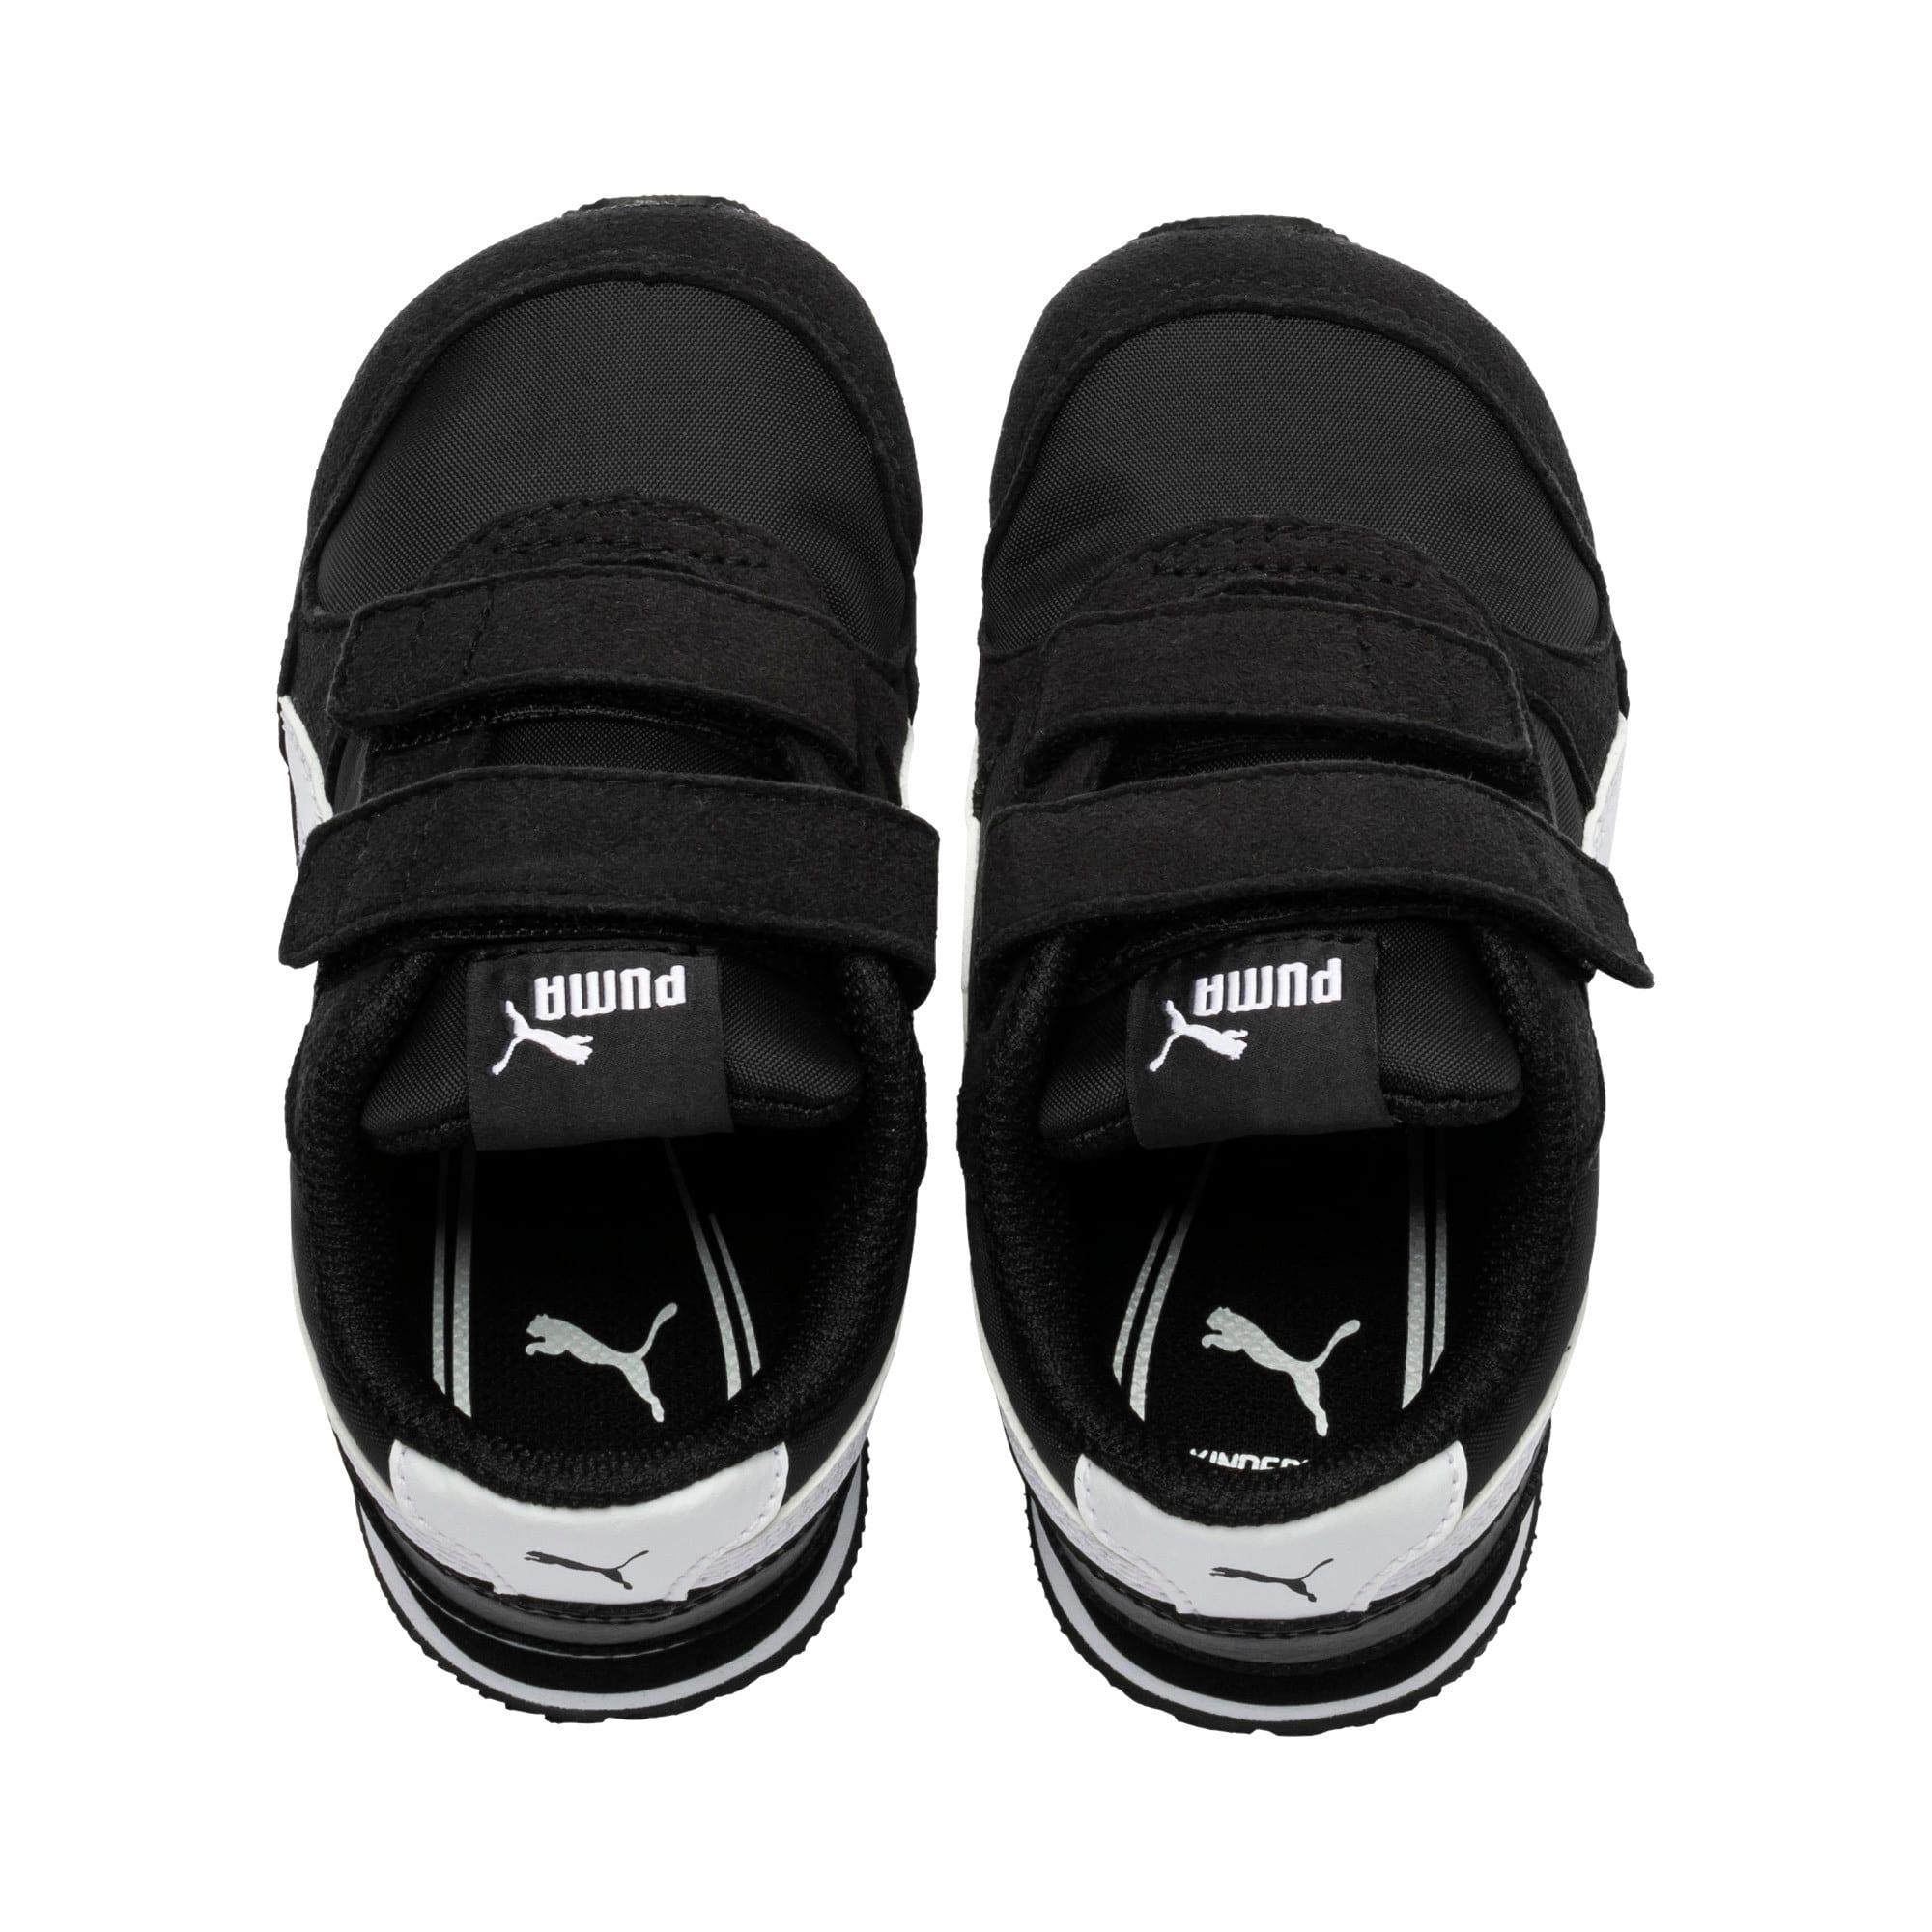 Thumbnail 6 of ST Runner V2 V Toddler Shoes, Puma Black-Puma White, medium